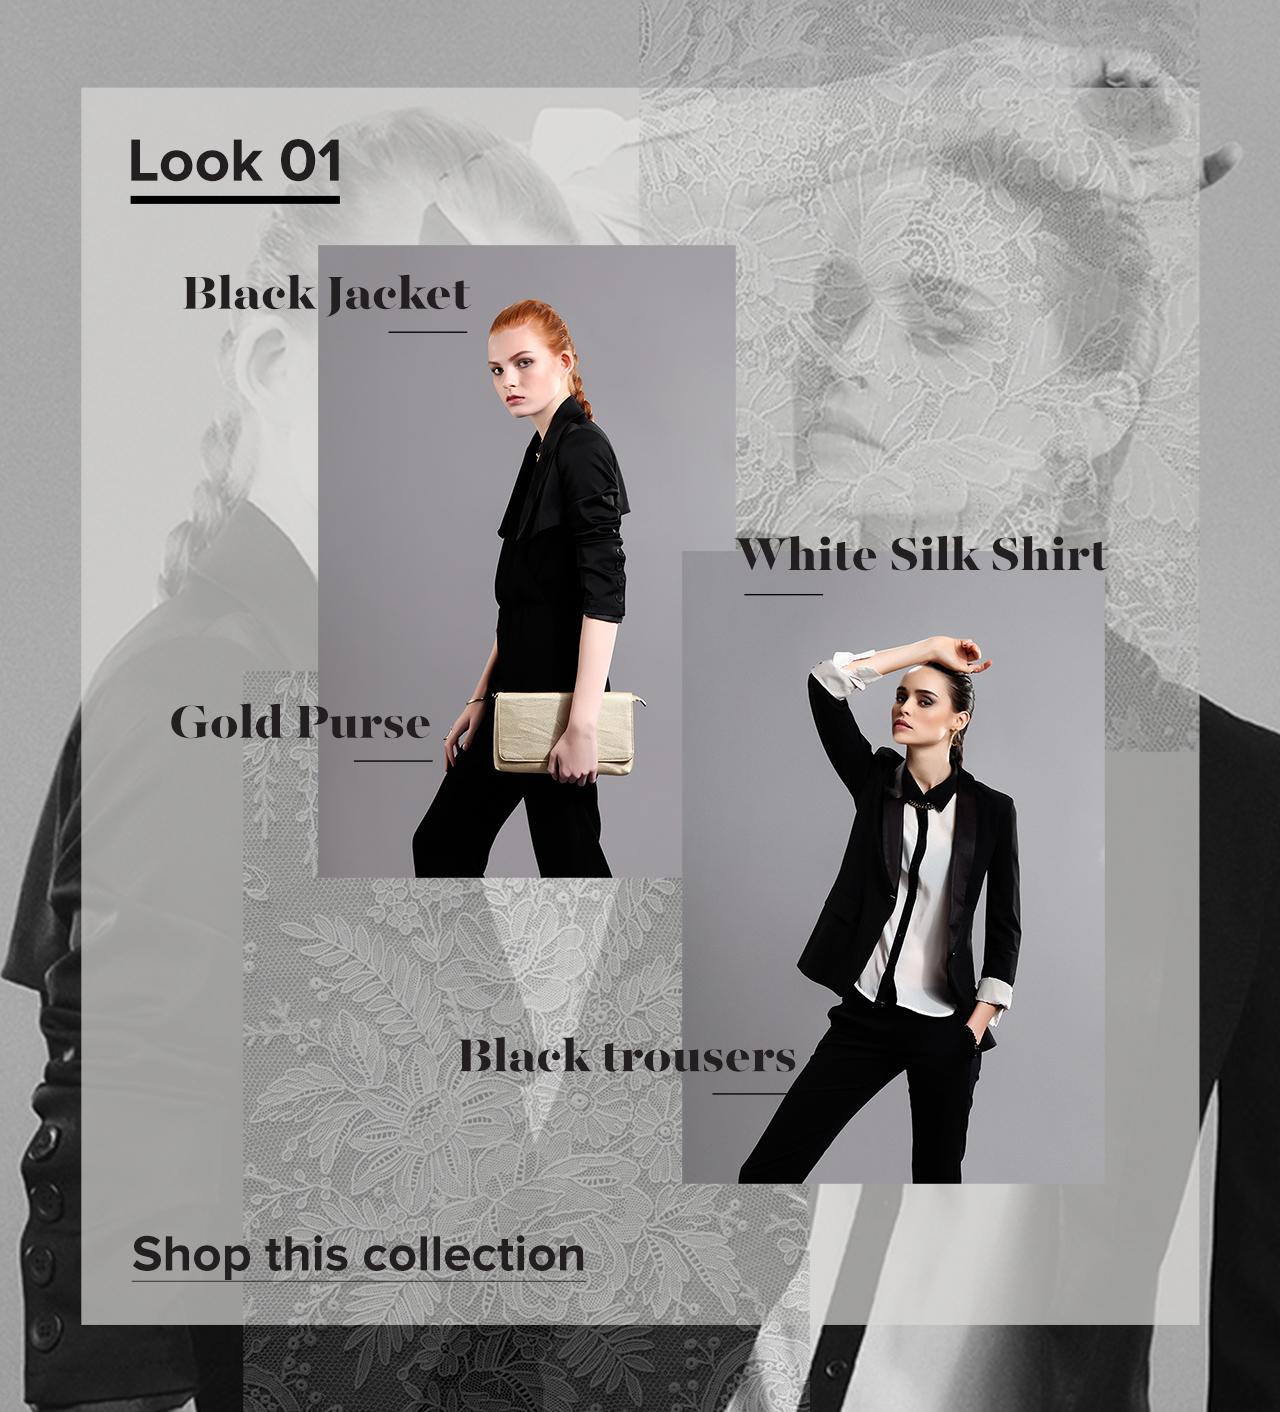 Chosen Look detail